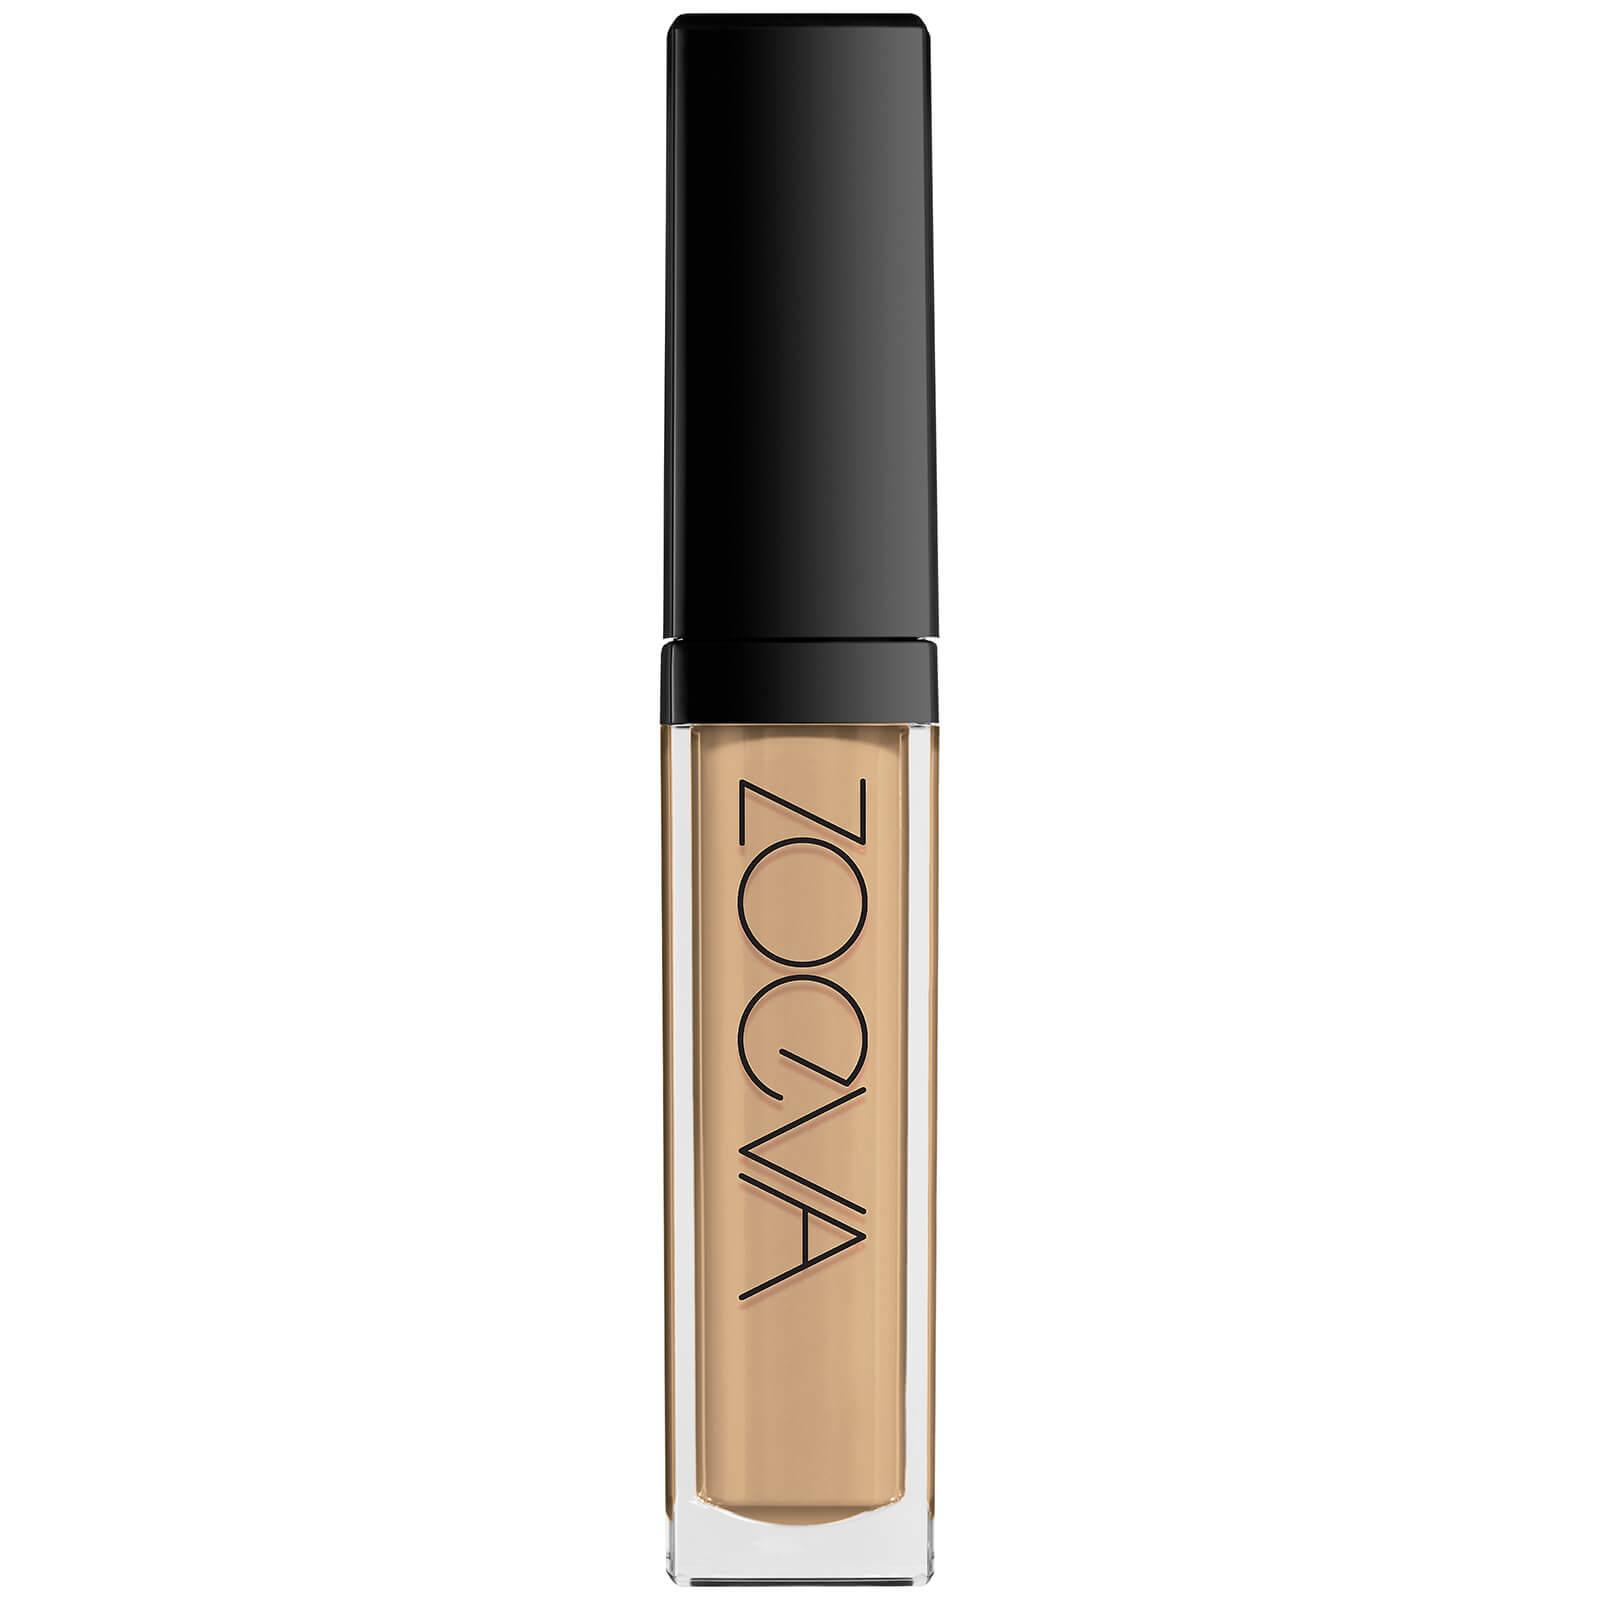 ZOEVA Authentik Skin Perfector 6ml (Various Shades) - 050 Certain